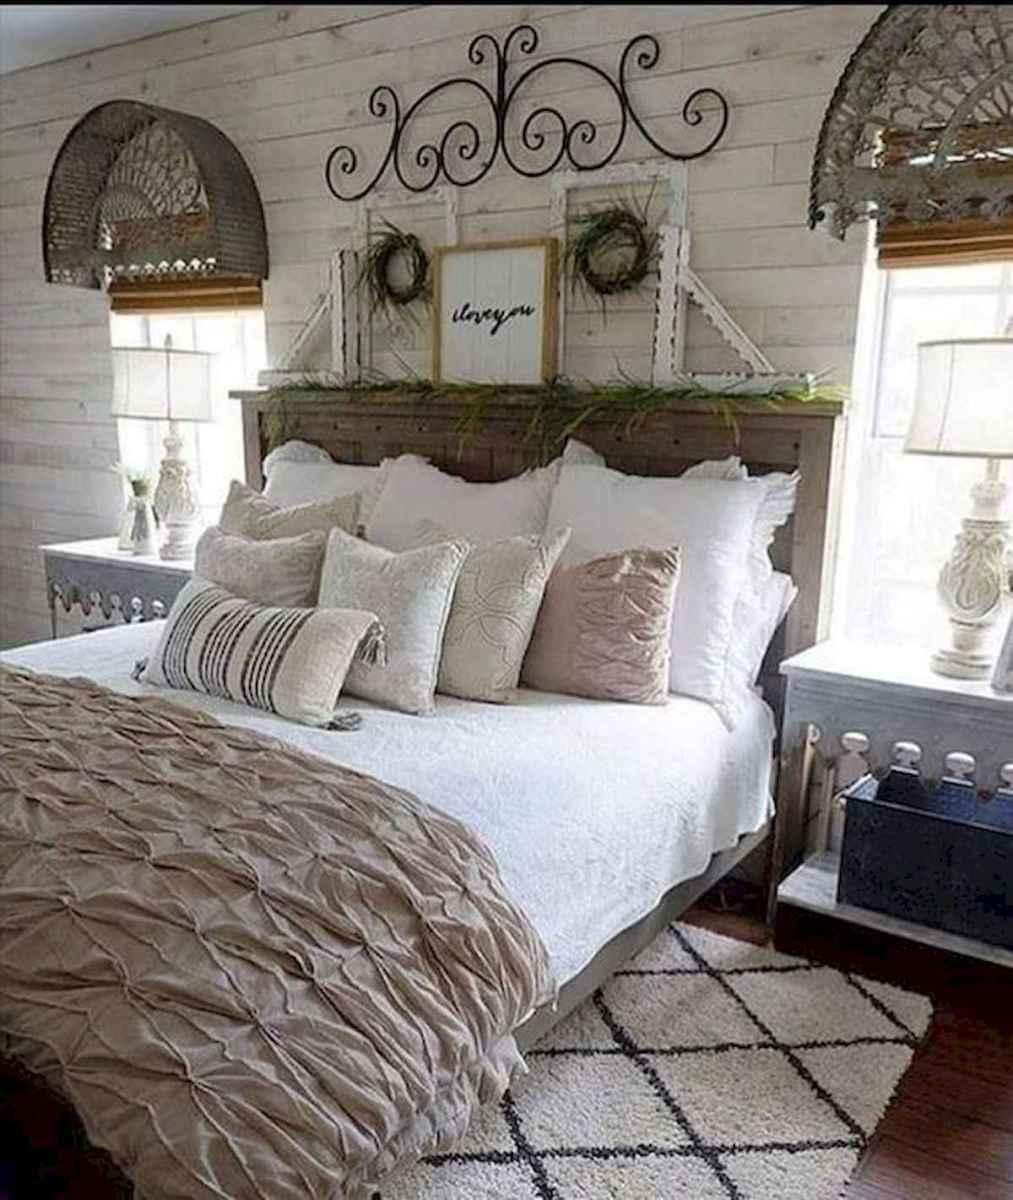 50 Favorite Bedding for Farmhouse Bedroom Design Ideas and Decor (10)